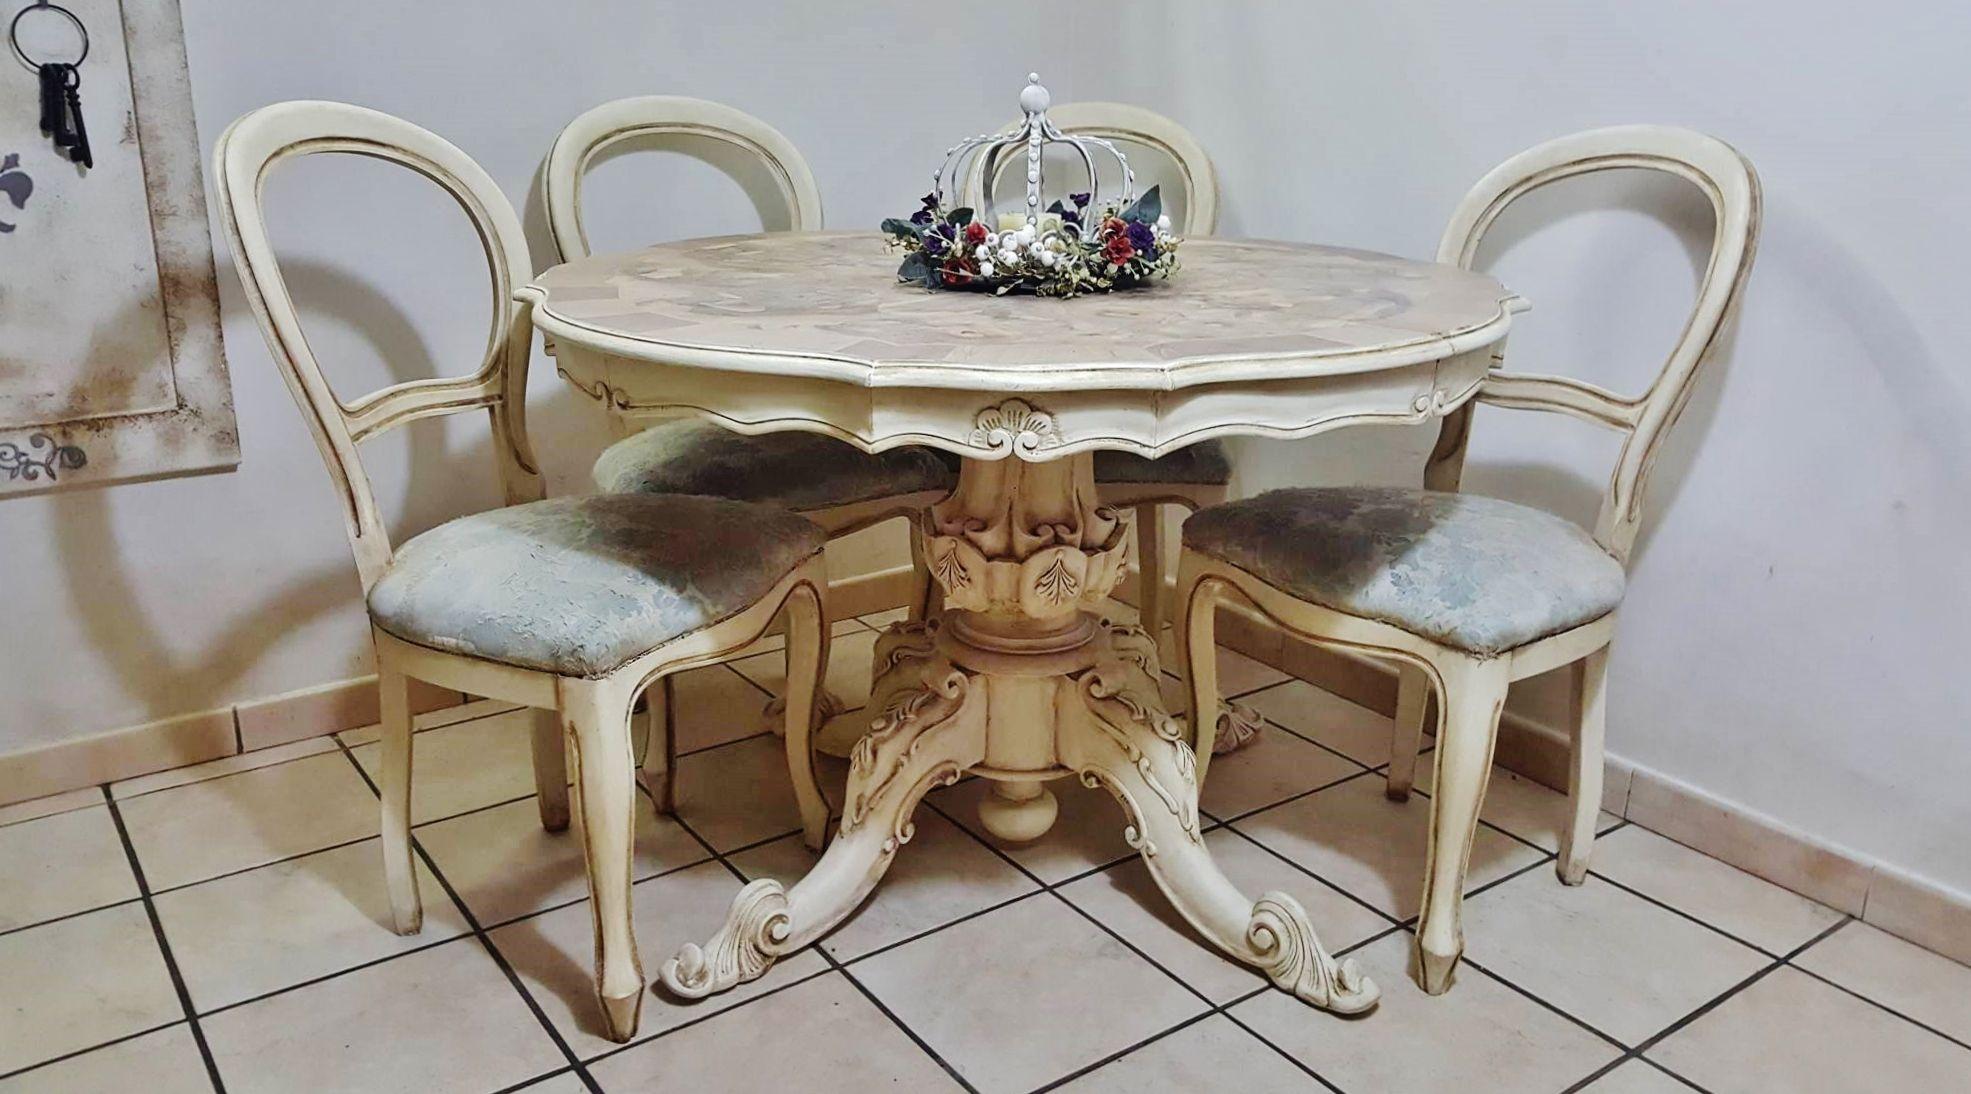 Tavolo Da Pranzo Shabby : Tavolo da pranzo shabby chic tavolo bianco decapato stile shabby